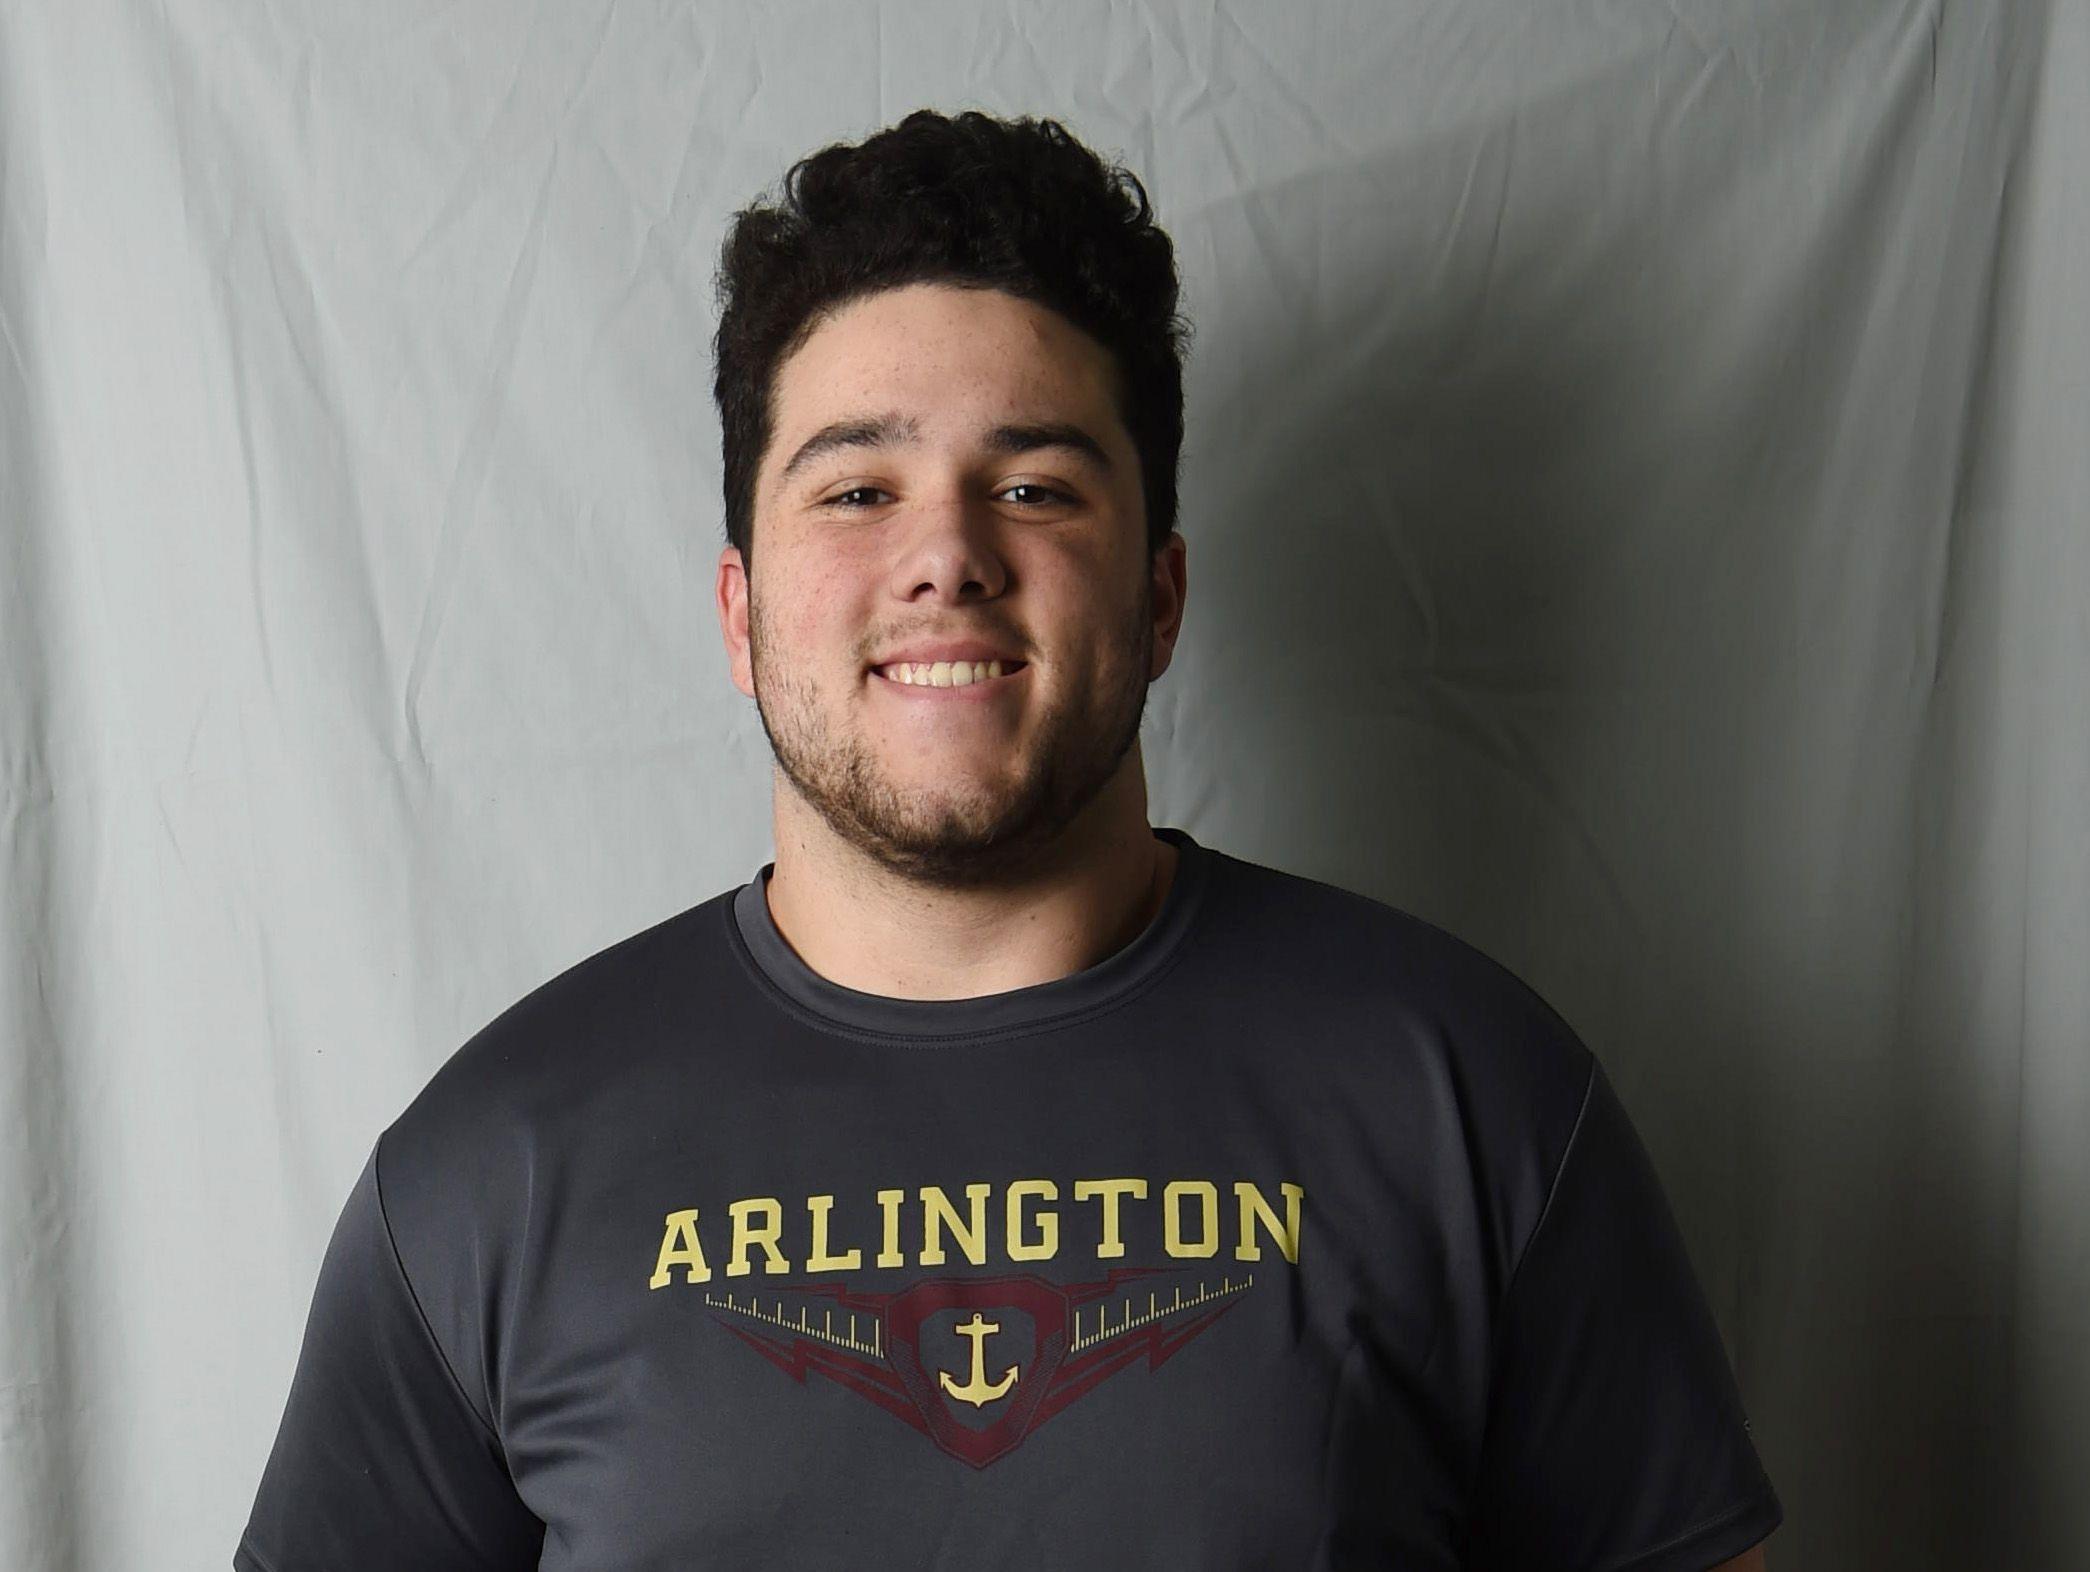 Jordan Valerius-Twiman from Arlington High School is the Defensive Lineman of the Year.